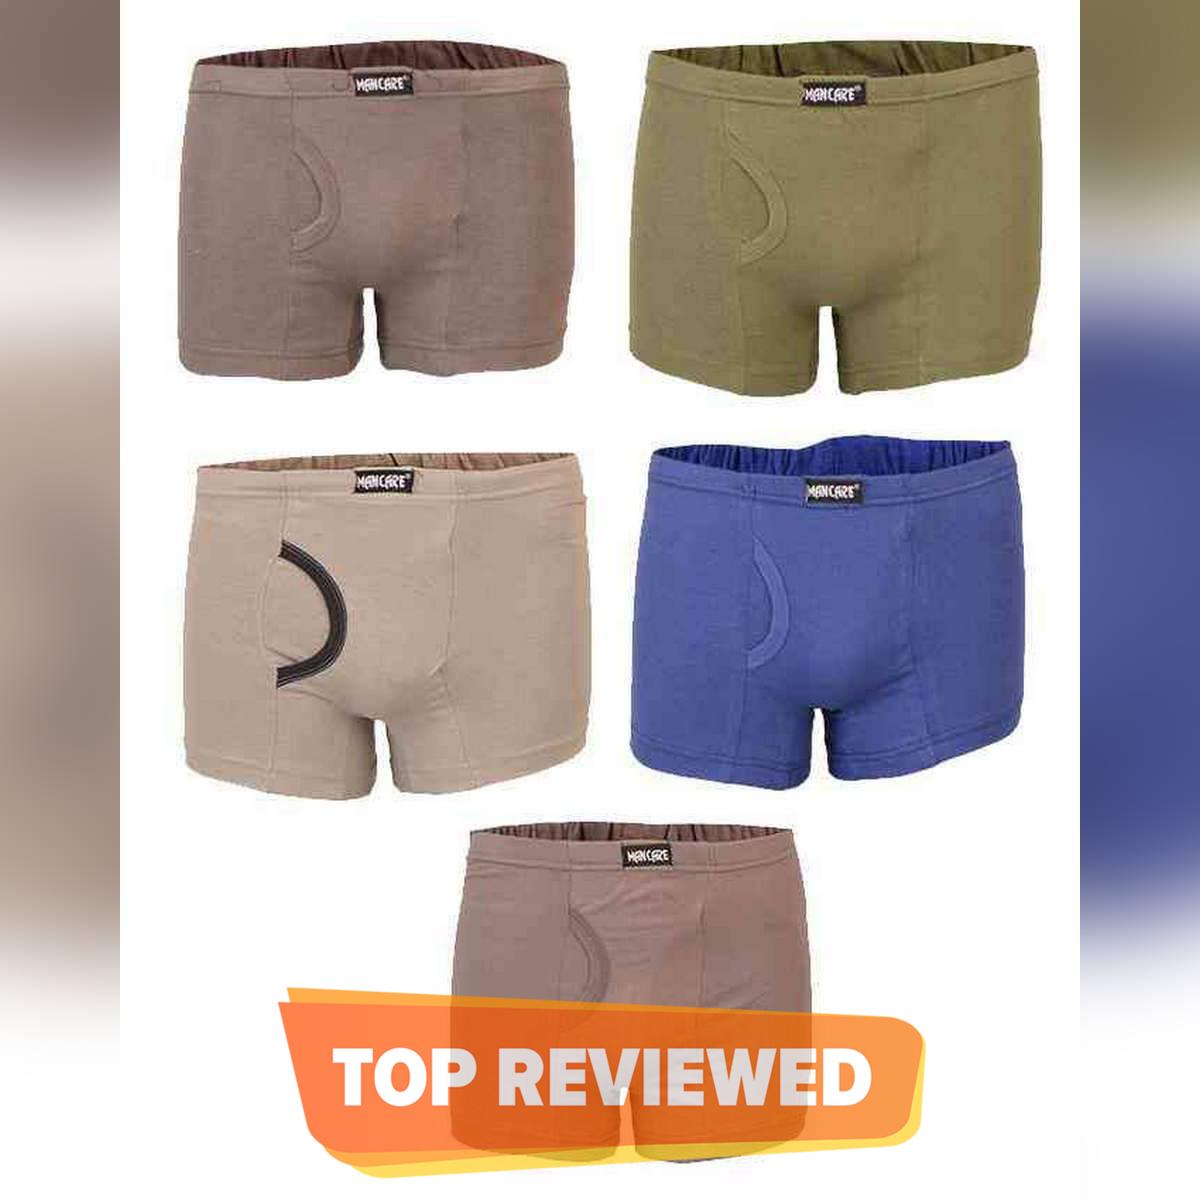 Mancare Pack of 5 Pure Cotton Underwear for Men - Multicolour